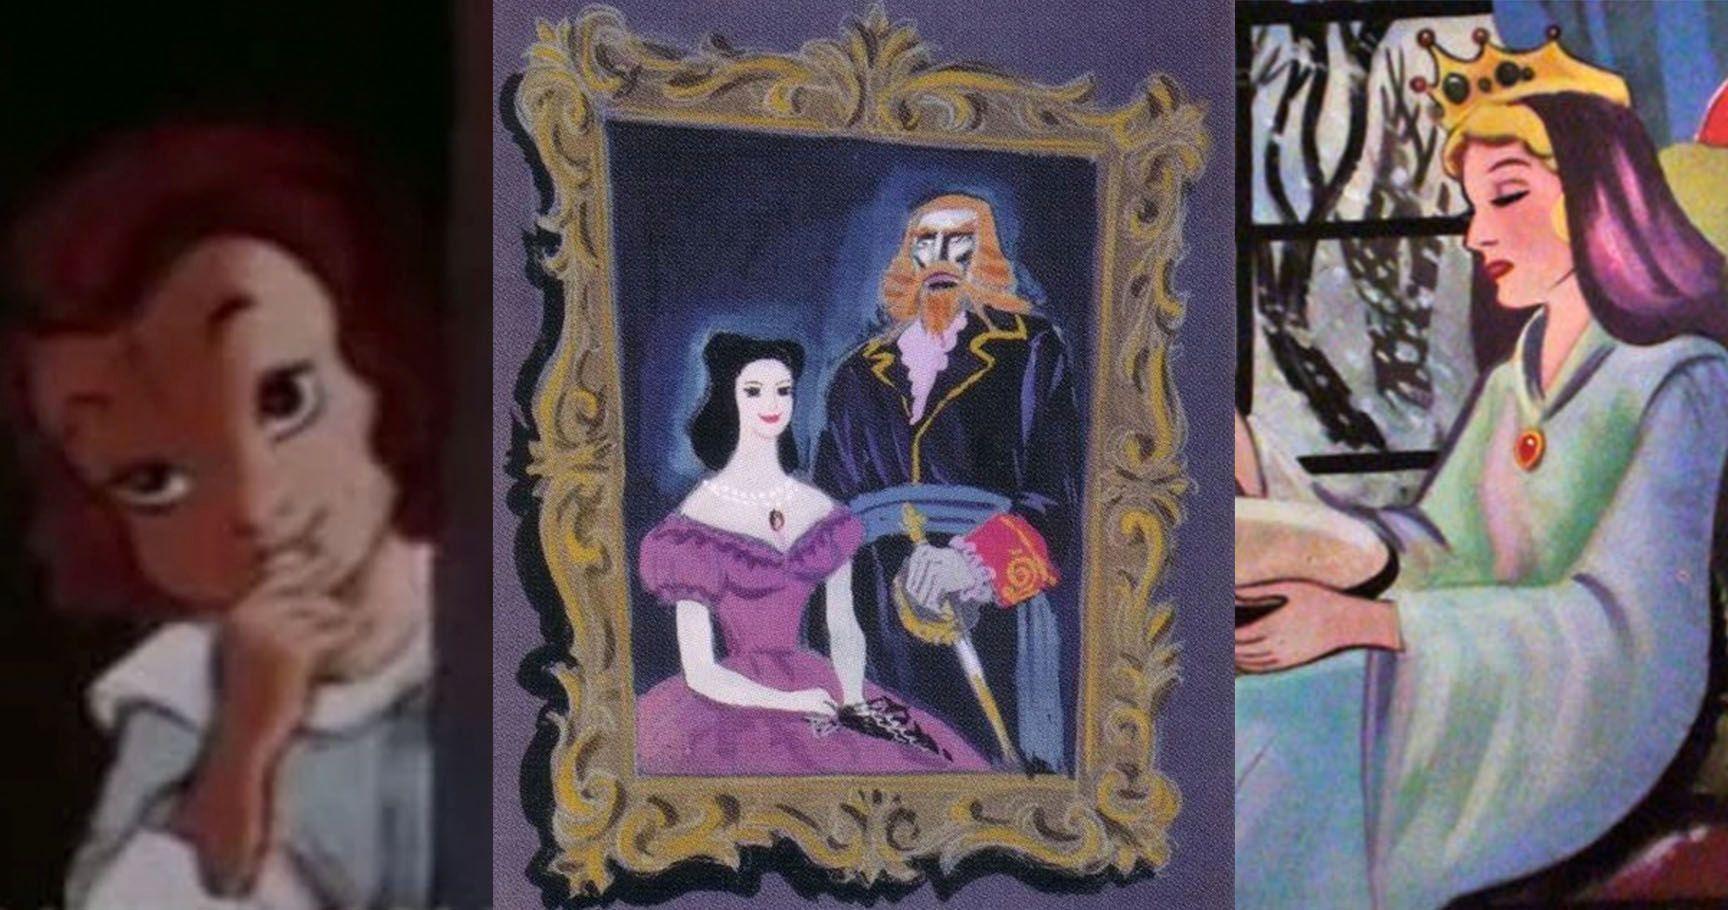 The Disney Vault: 15 Disney Princesses They Never Released